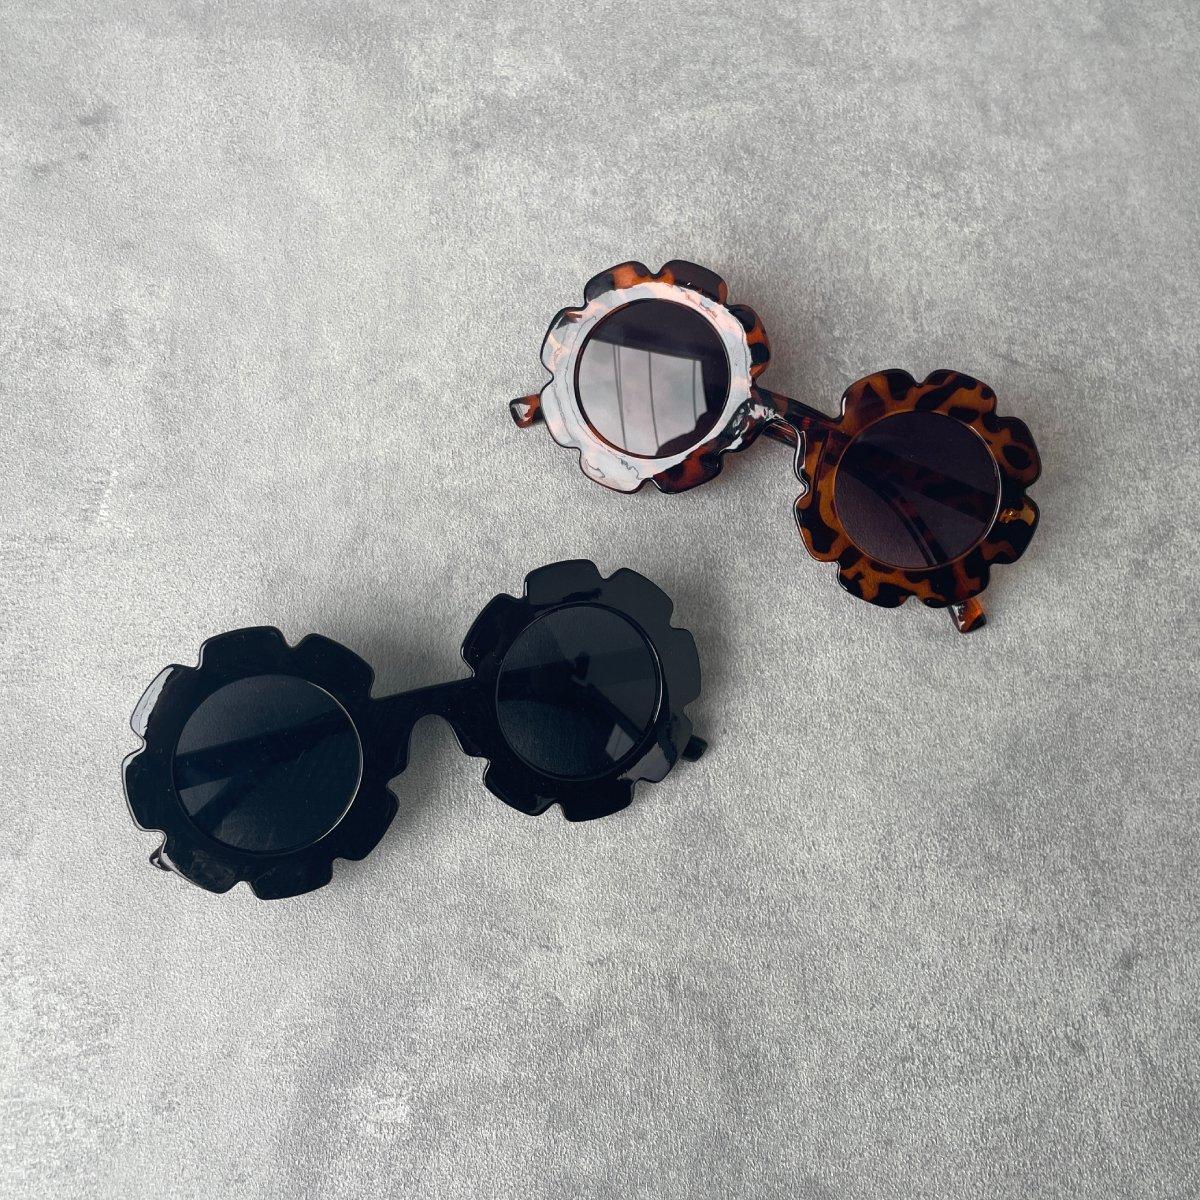 【KIDS】Kids Flower Sunglasses 詳細画像8